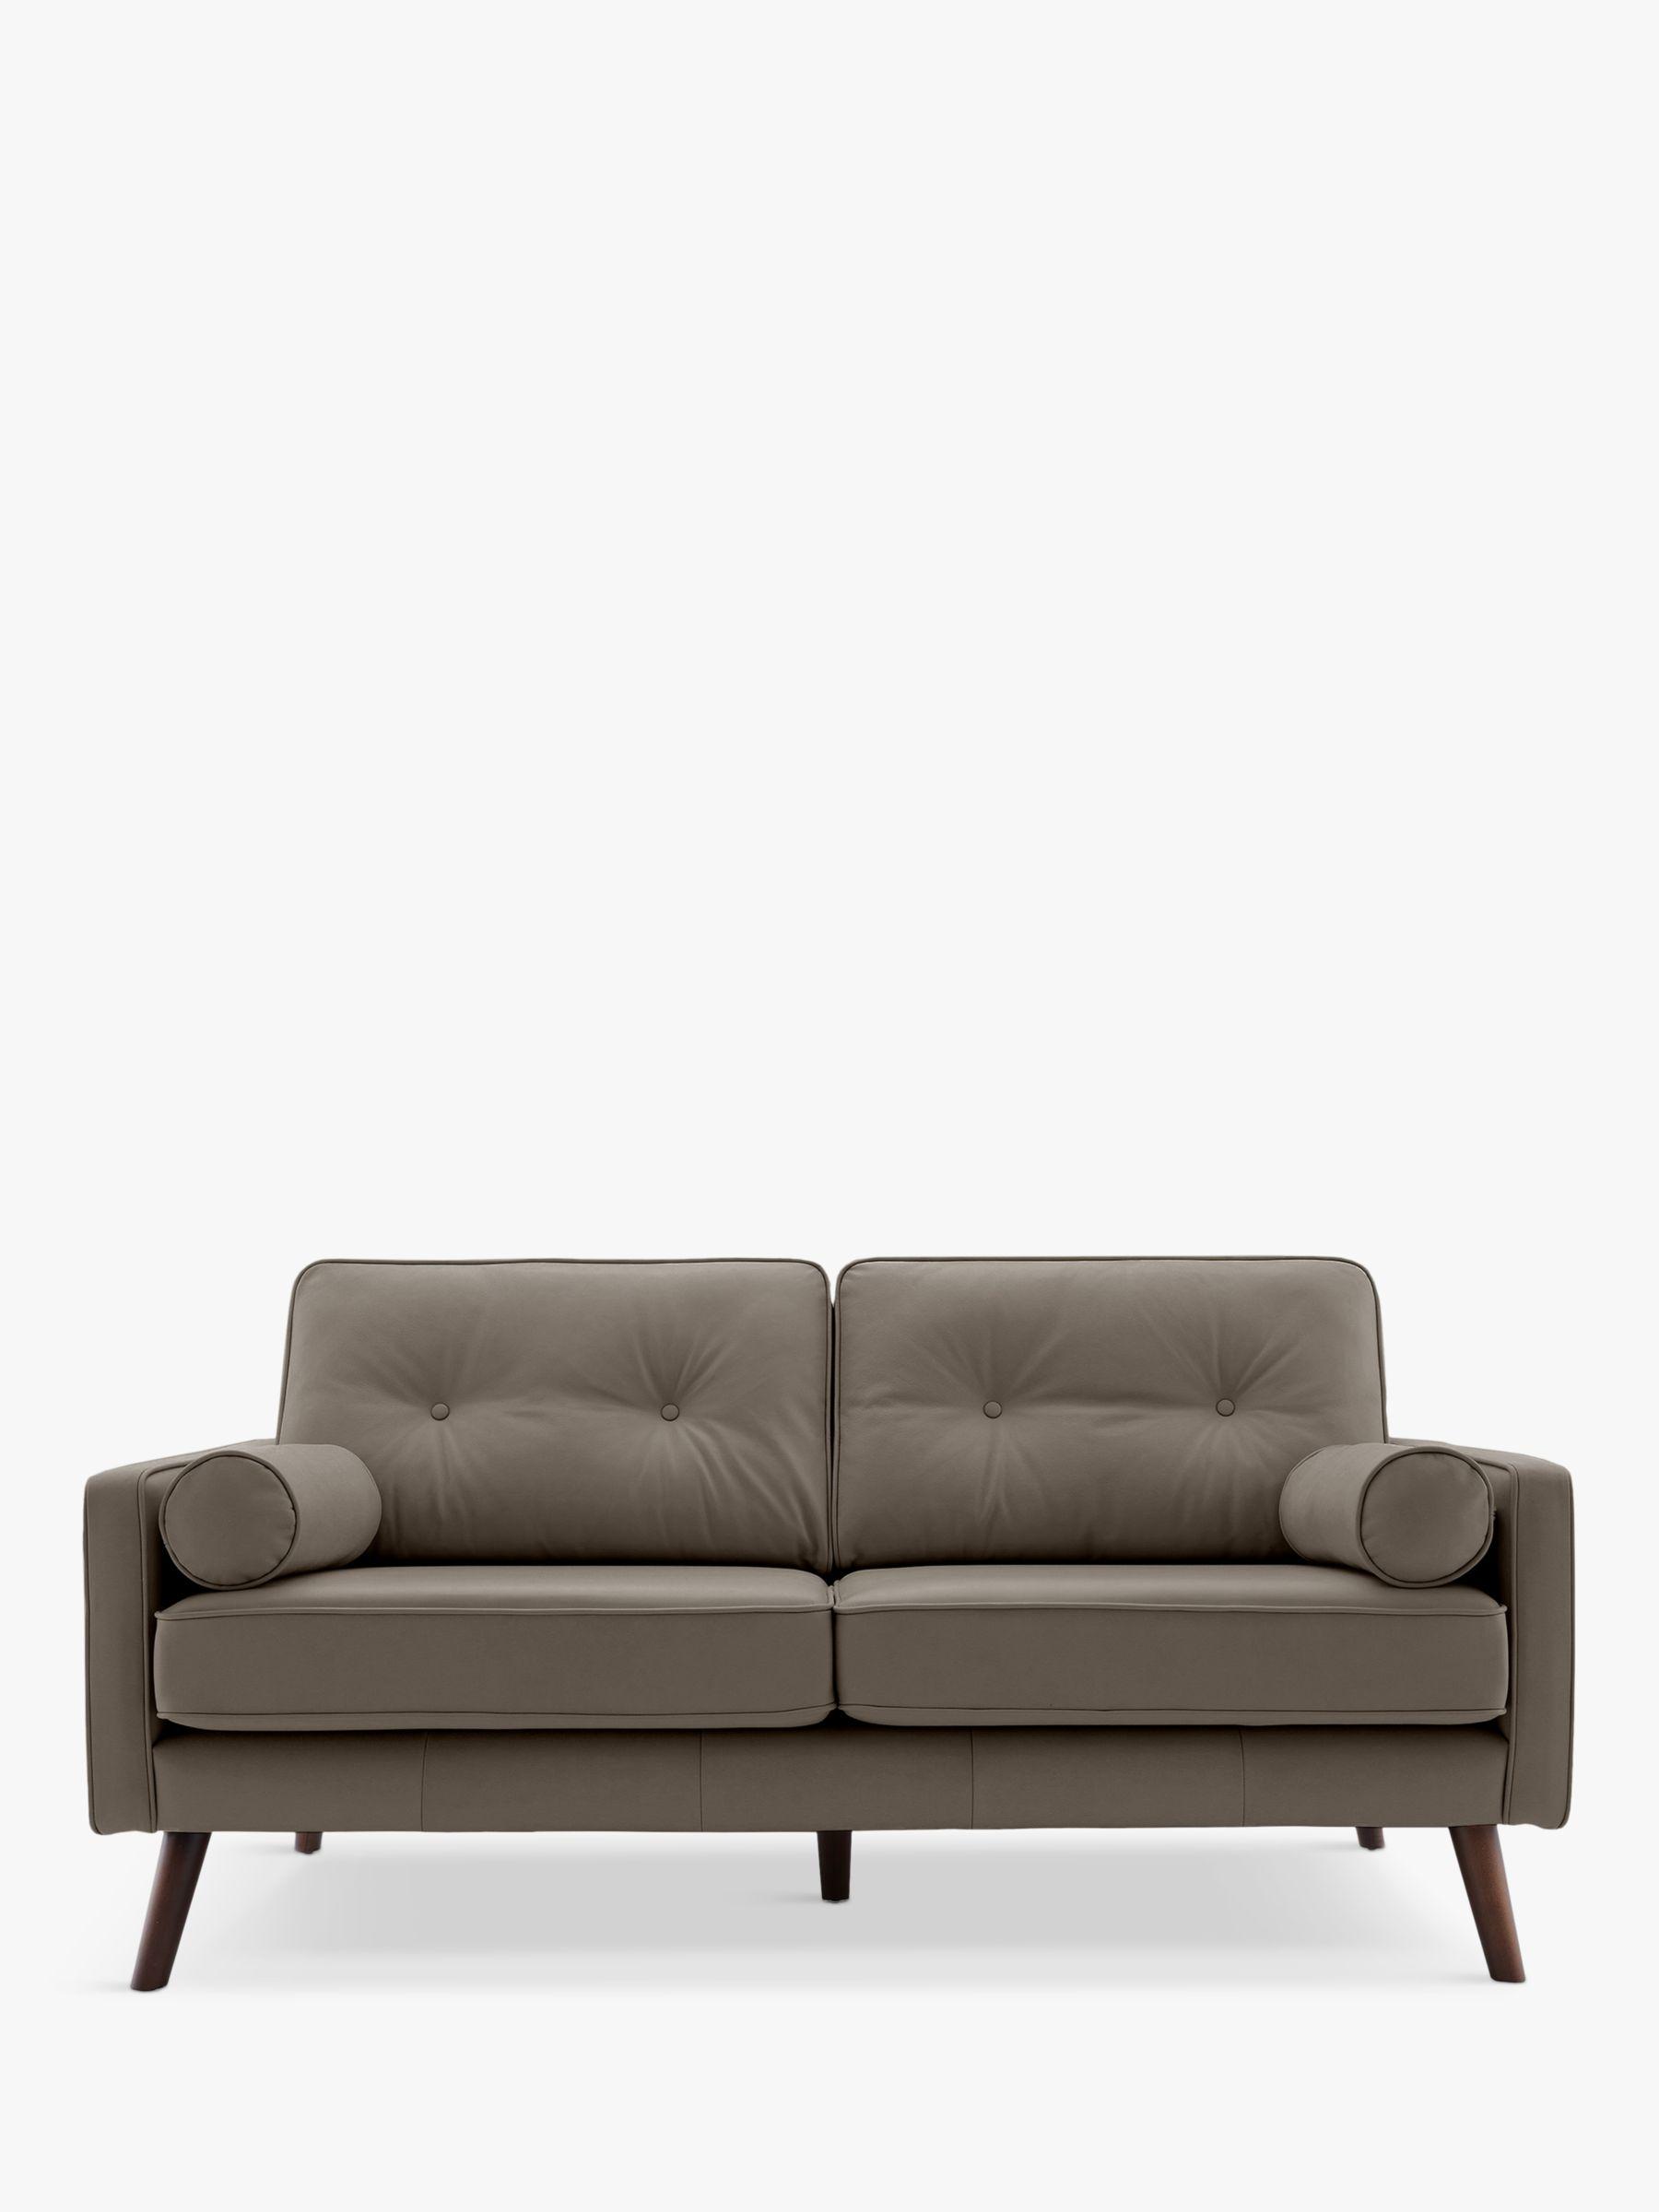 G Plan Vintage G Plan Vintage The Sixty Five Medium 2 Seater Leather Sofa